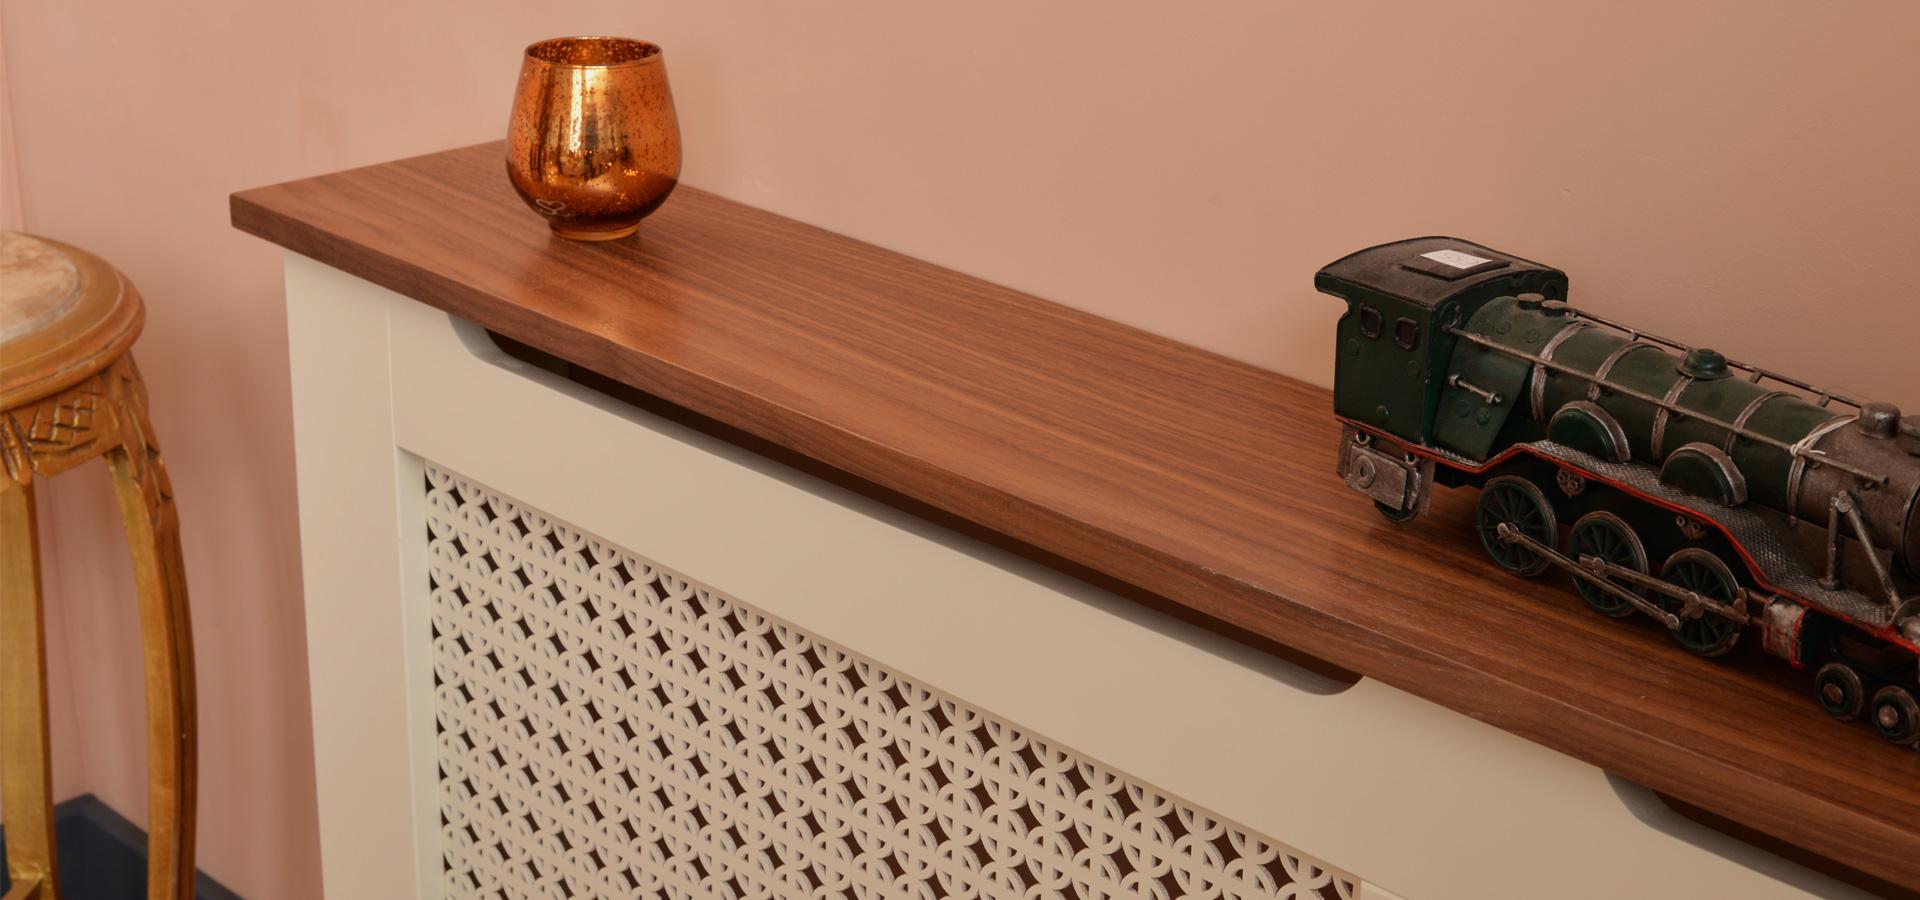 radiator-cover-walnut